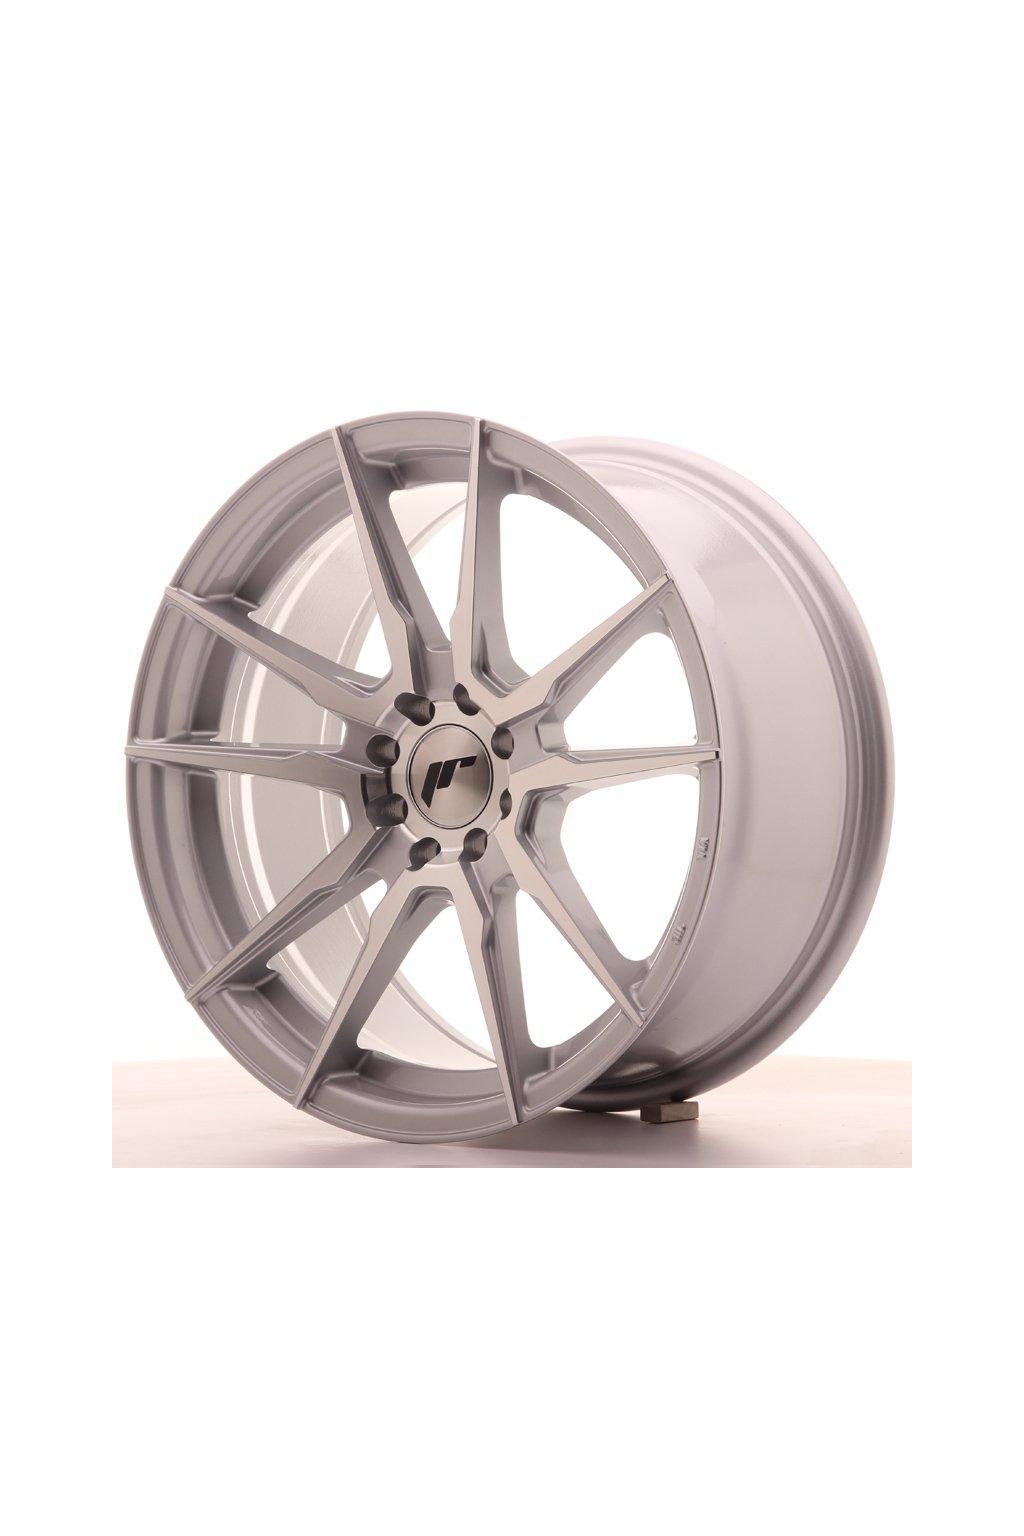 Disk Japan Racing JR21 17x8 ET25 4x100/108 Silver Mach